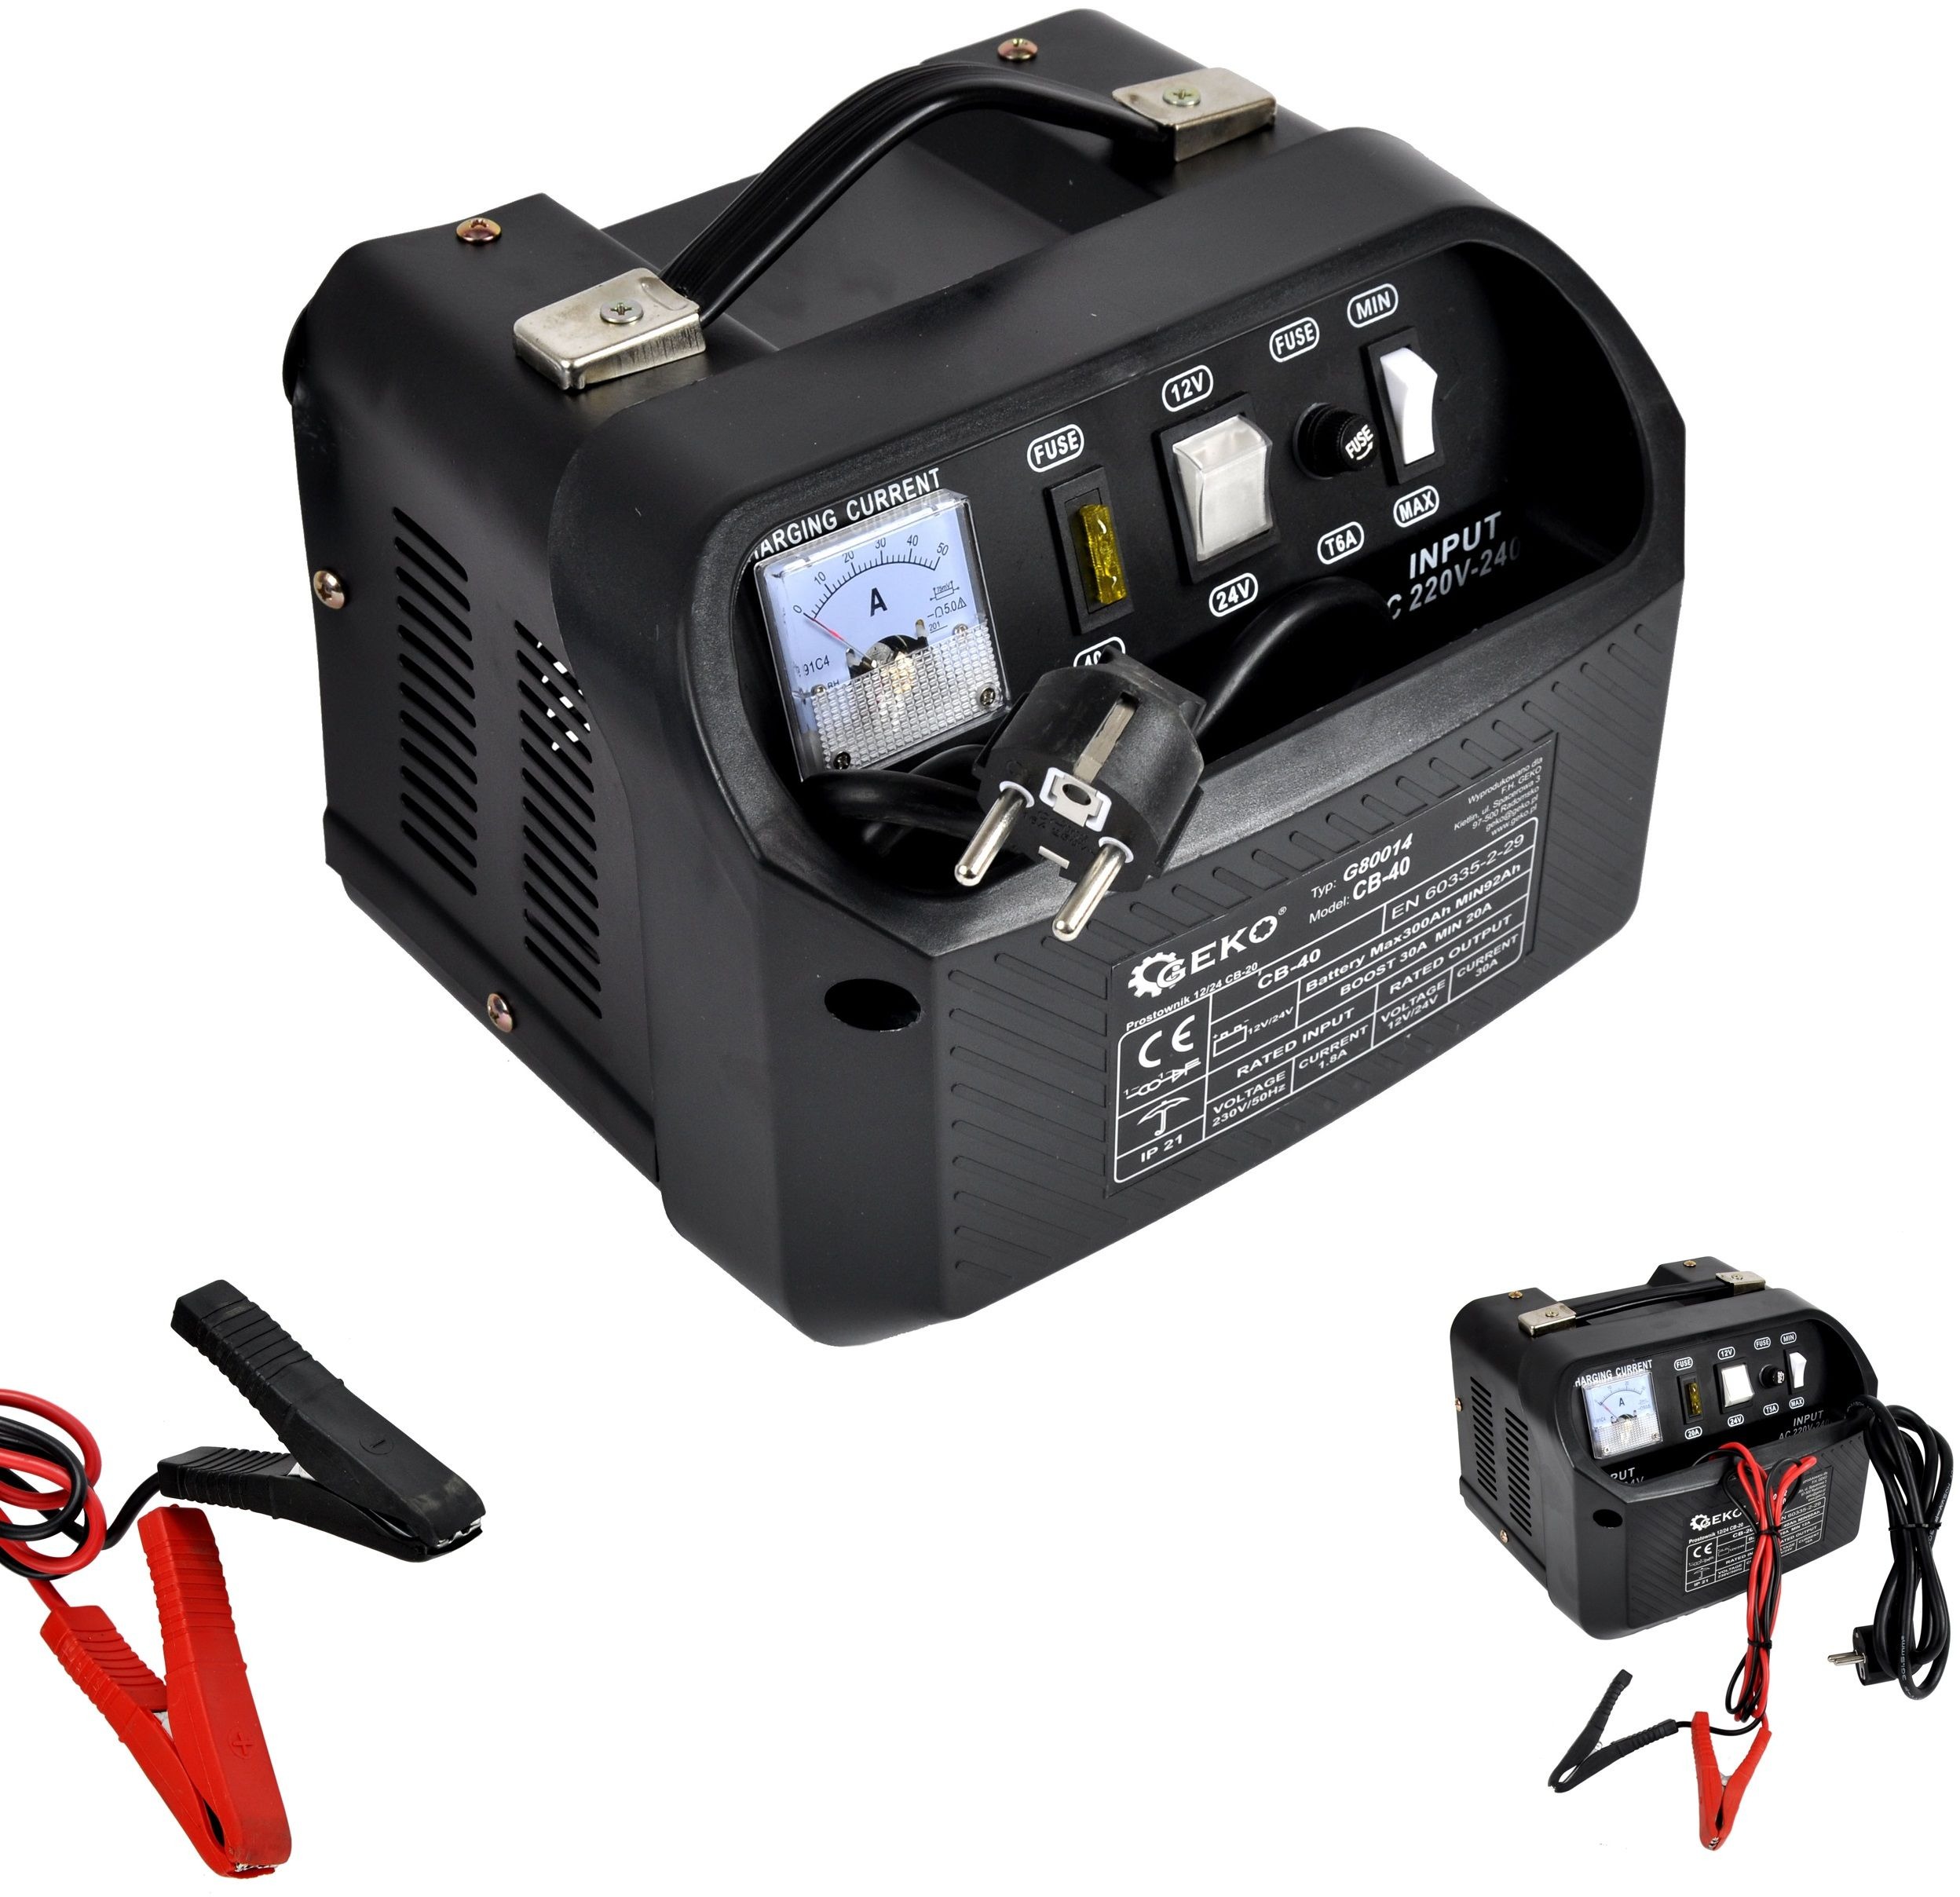 Prostownik 12V/24V 30A 300Ah ładowarka akumulatora